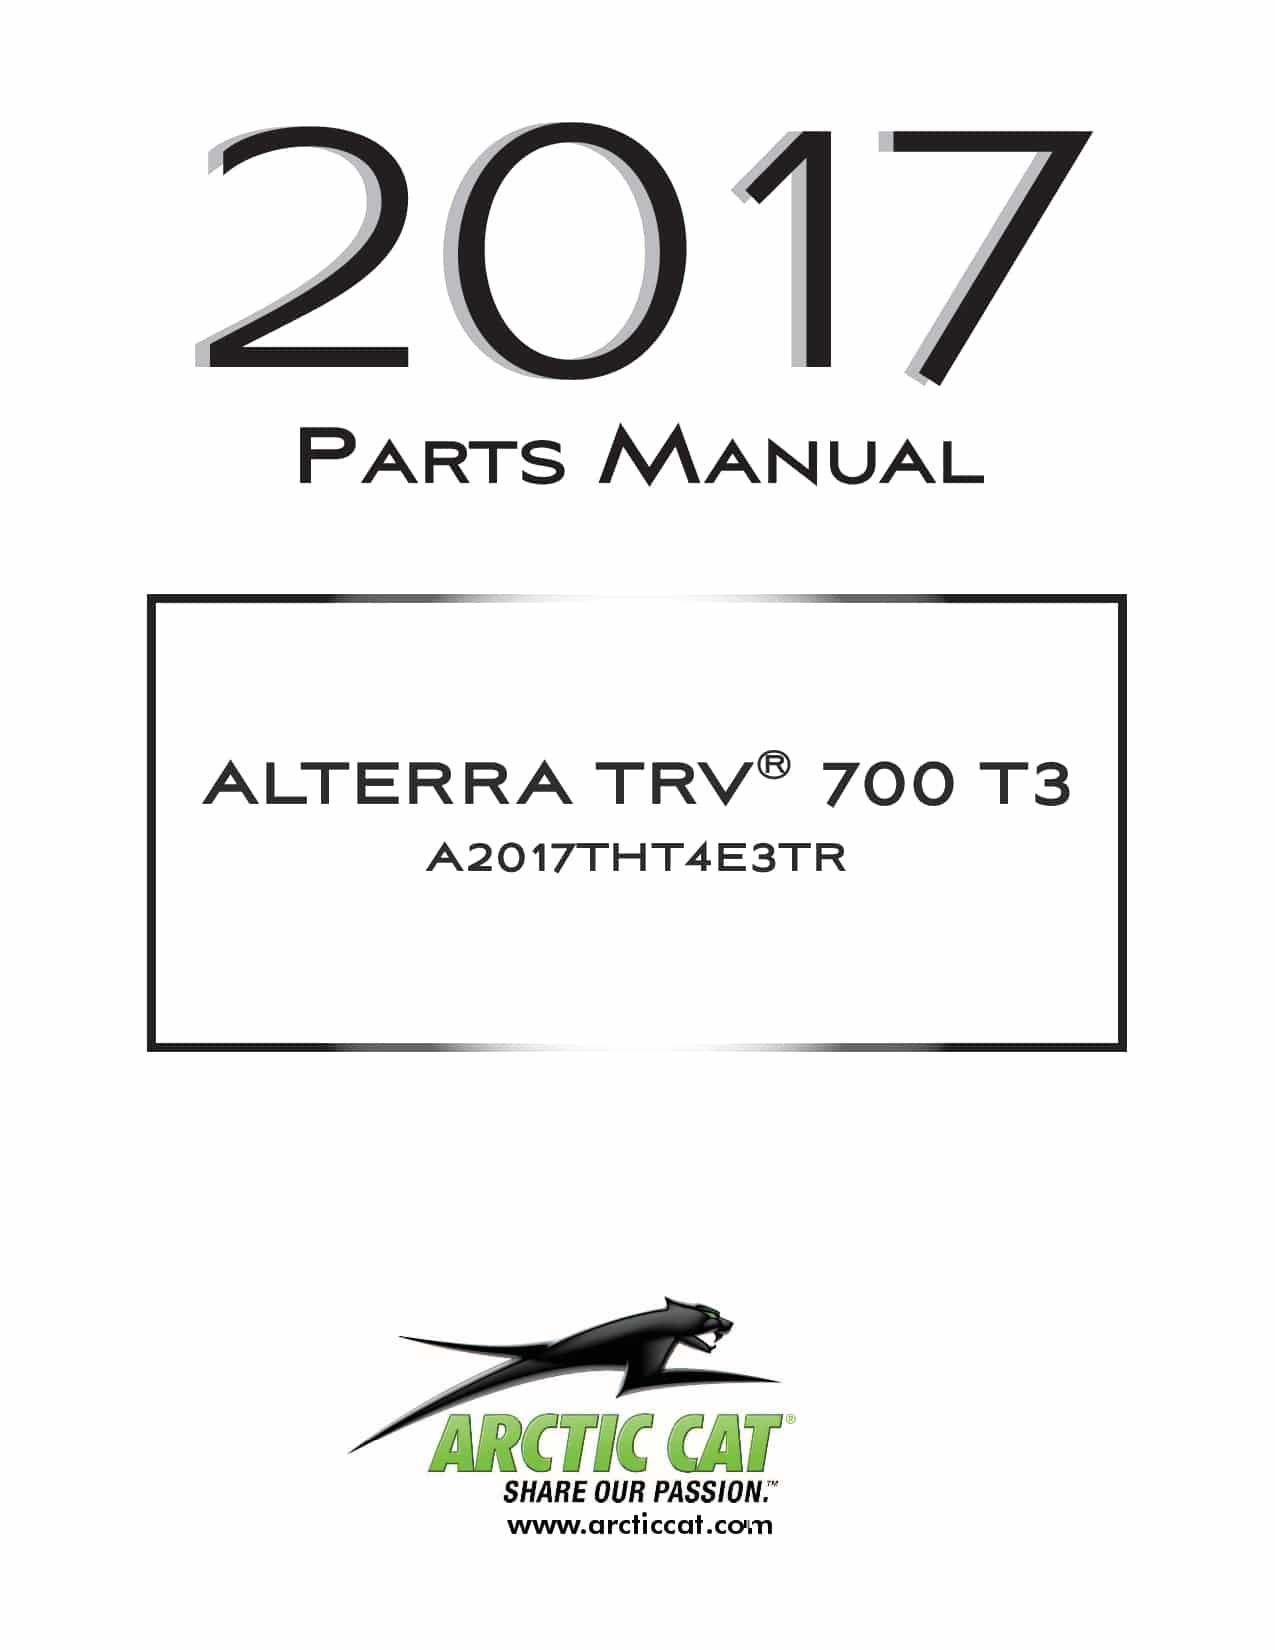 ARCTIC CAT 2017 Alterra TRV 700 T3b red part manual PDF